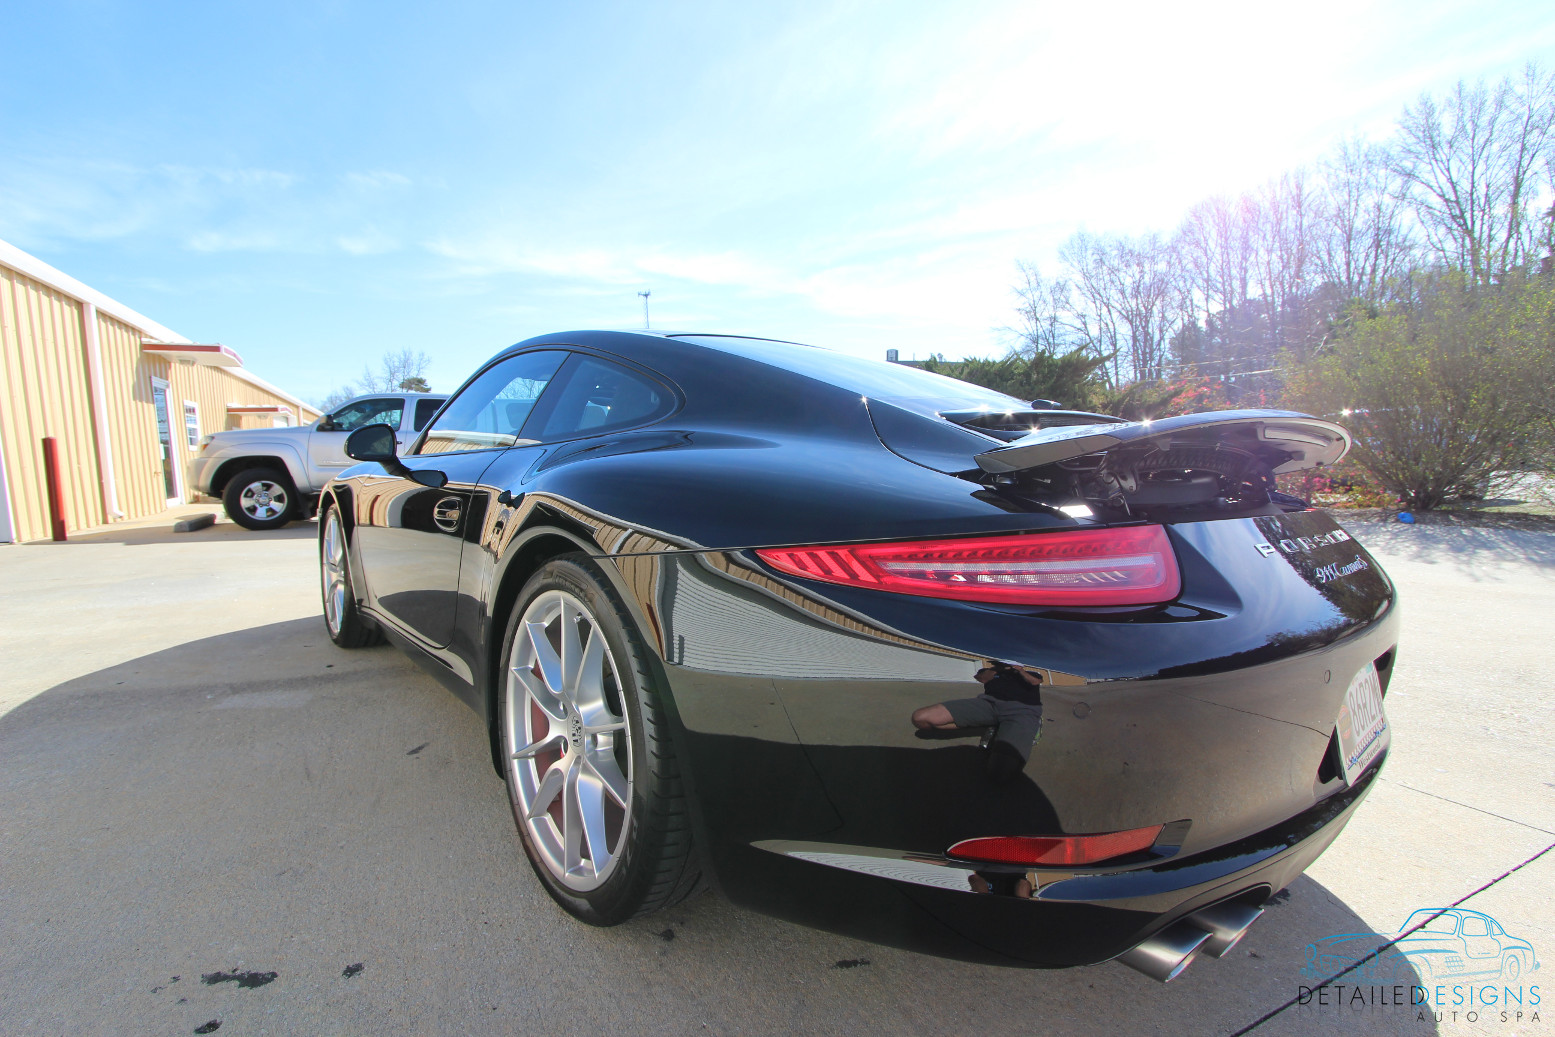 Porsche Clear Bra PPF car detailing